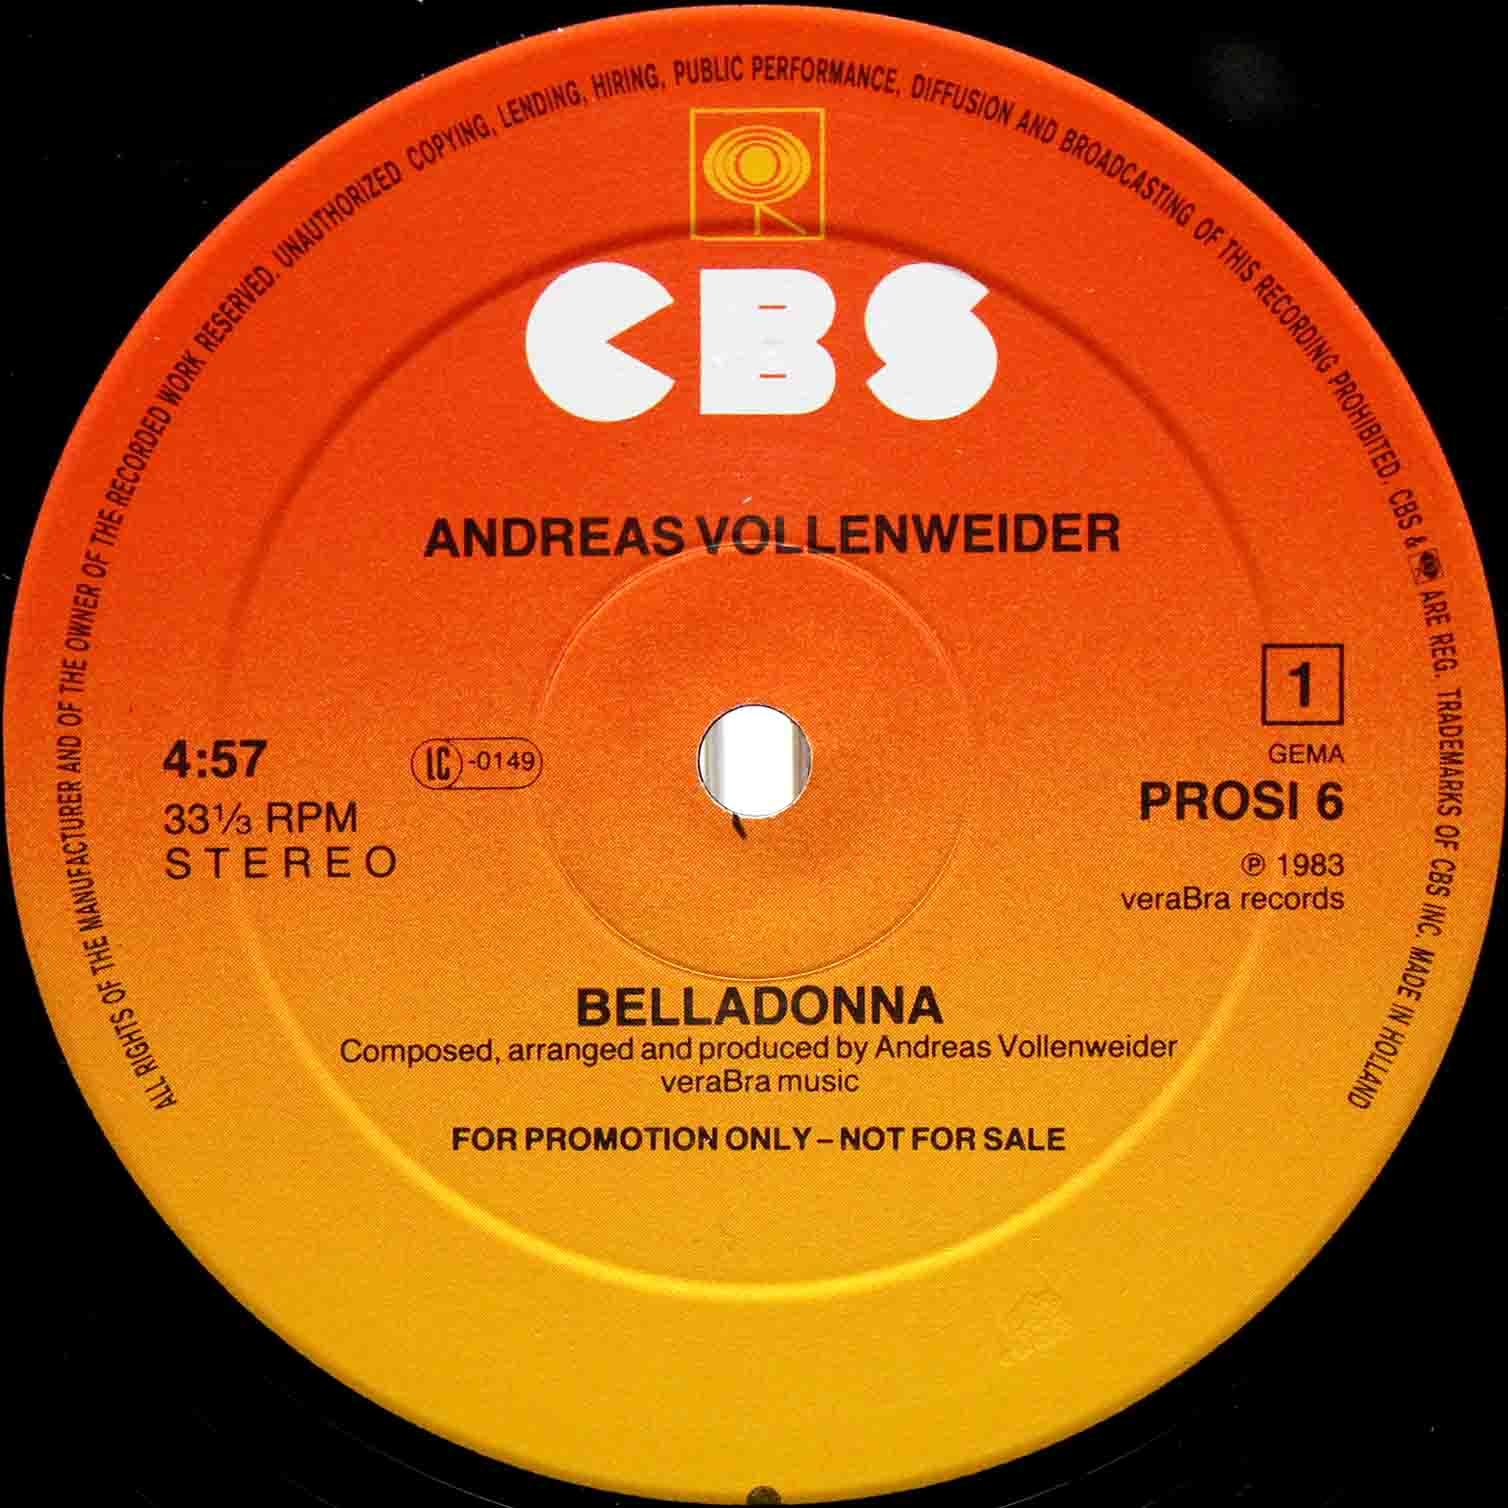 Andreas Vollenweider – Belladonna 03